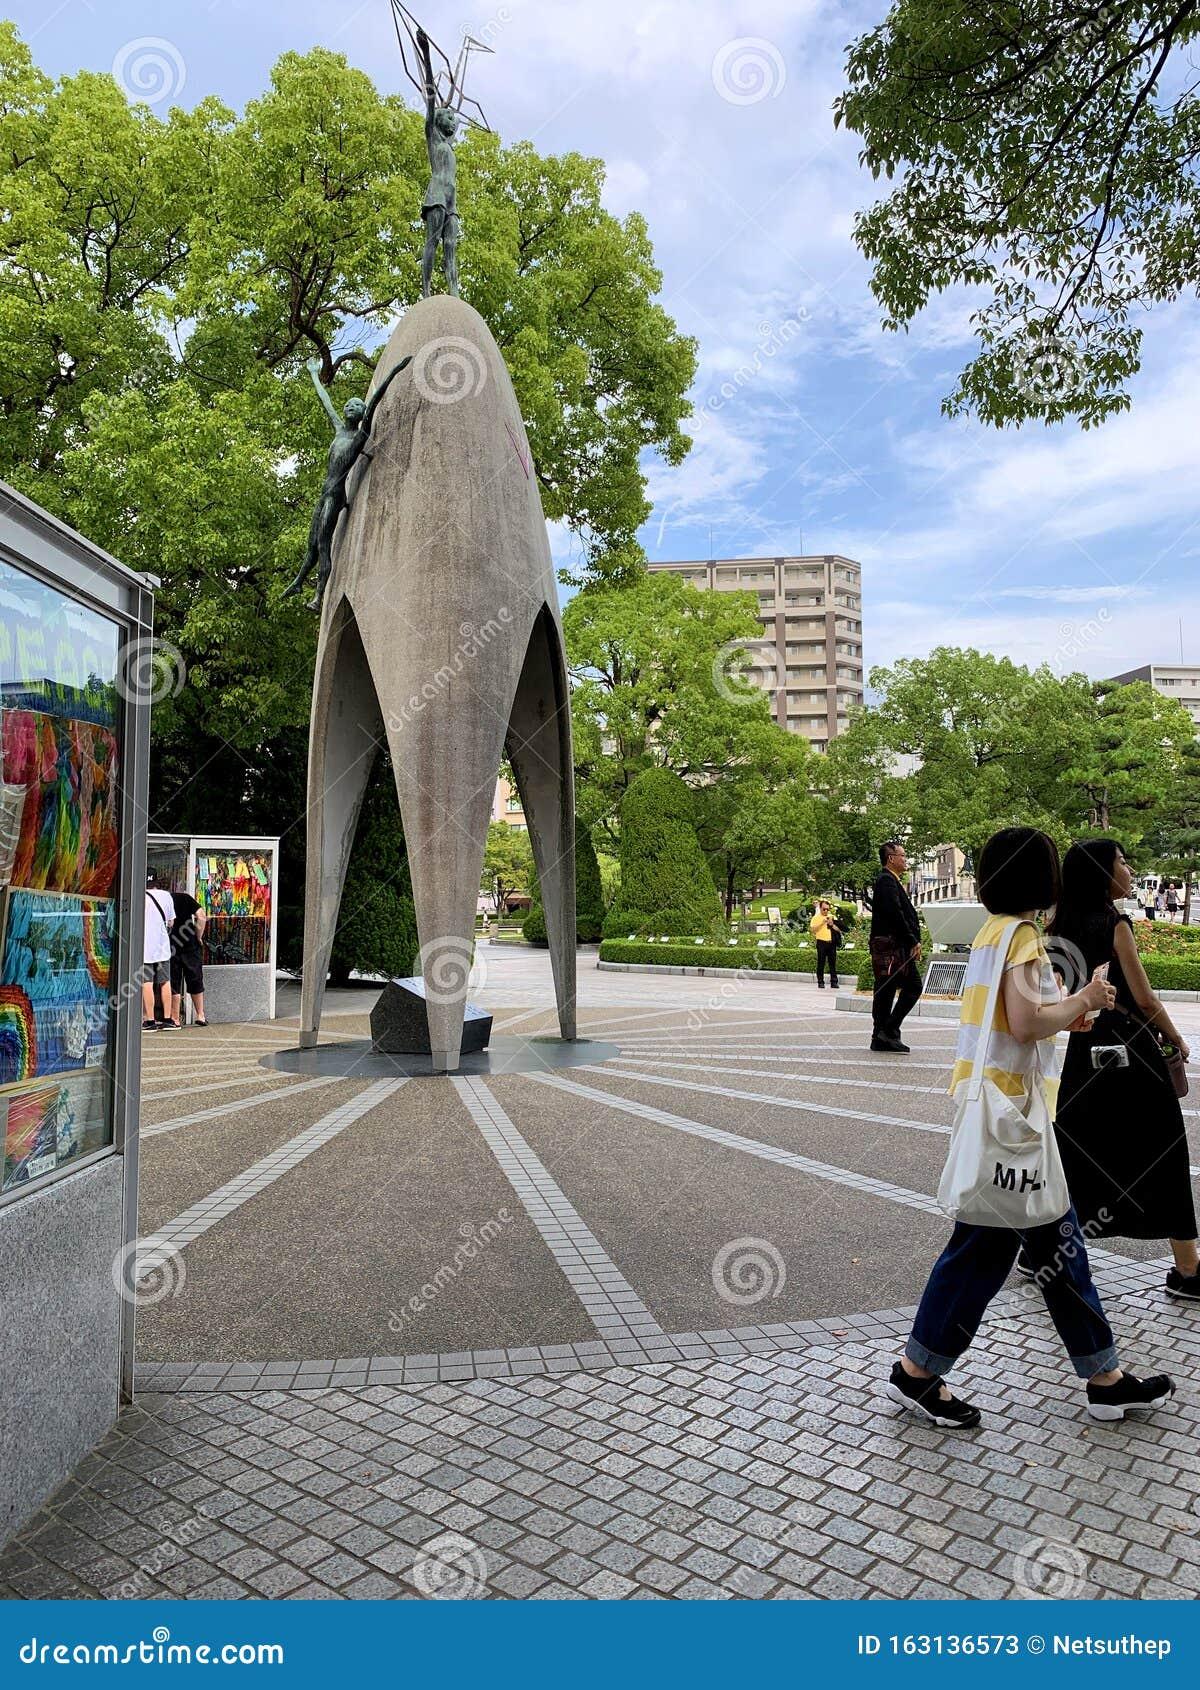 2000 Paper Cranes - A Memorial to Sadako Sasaki, a child